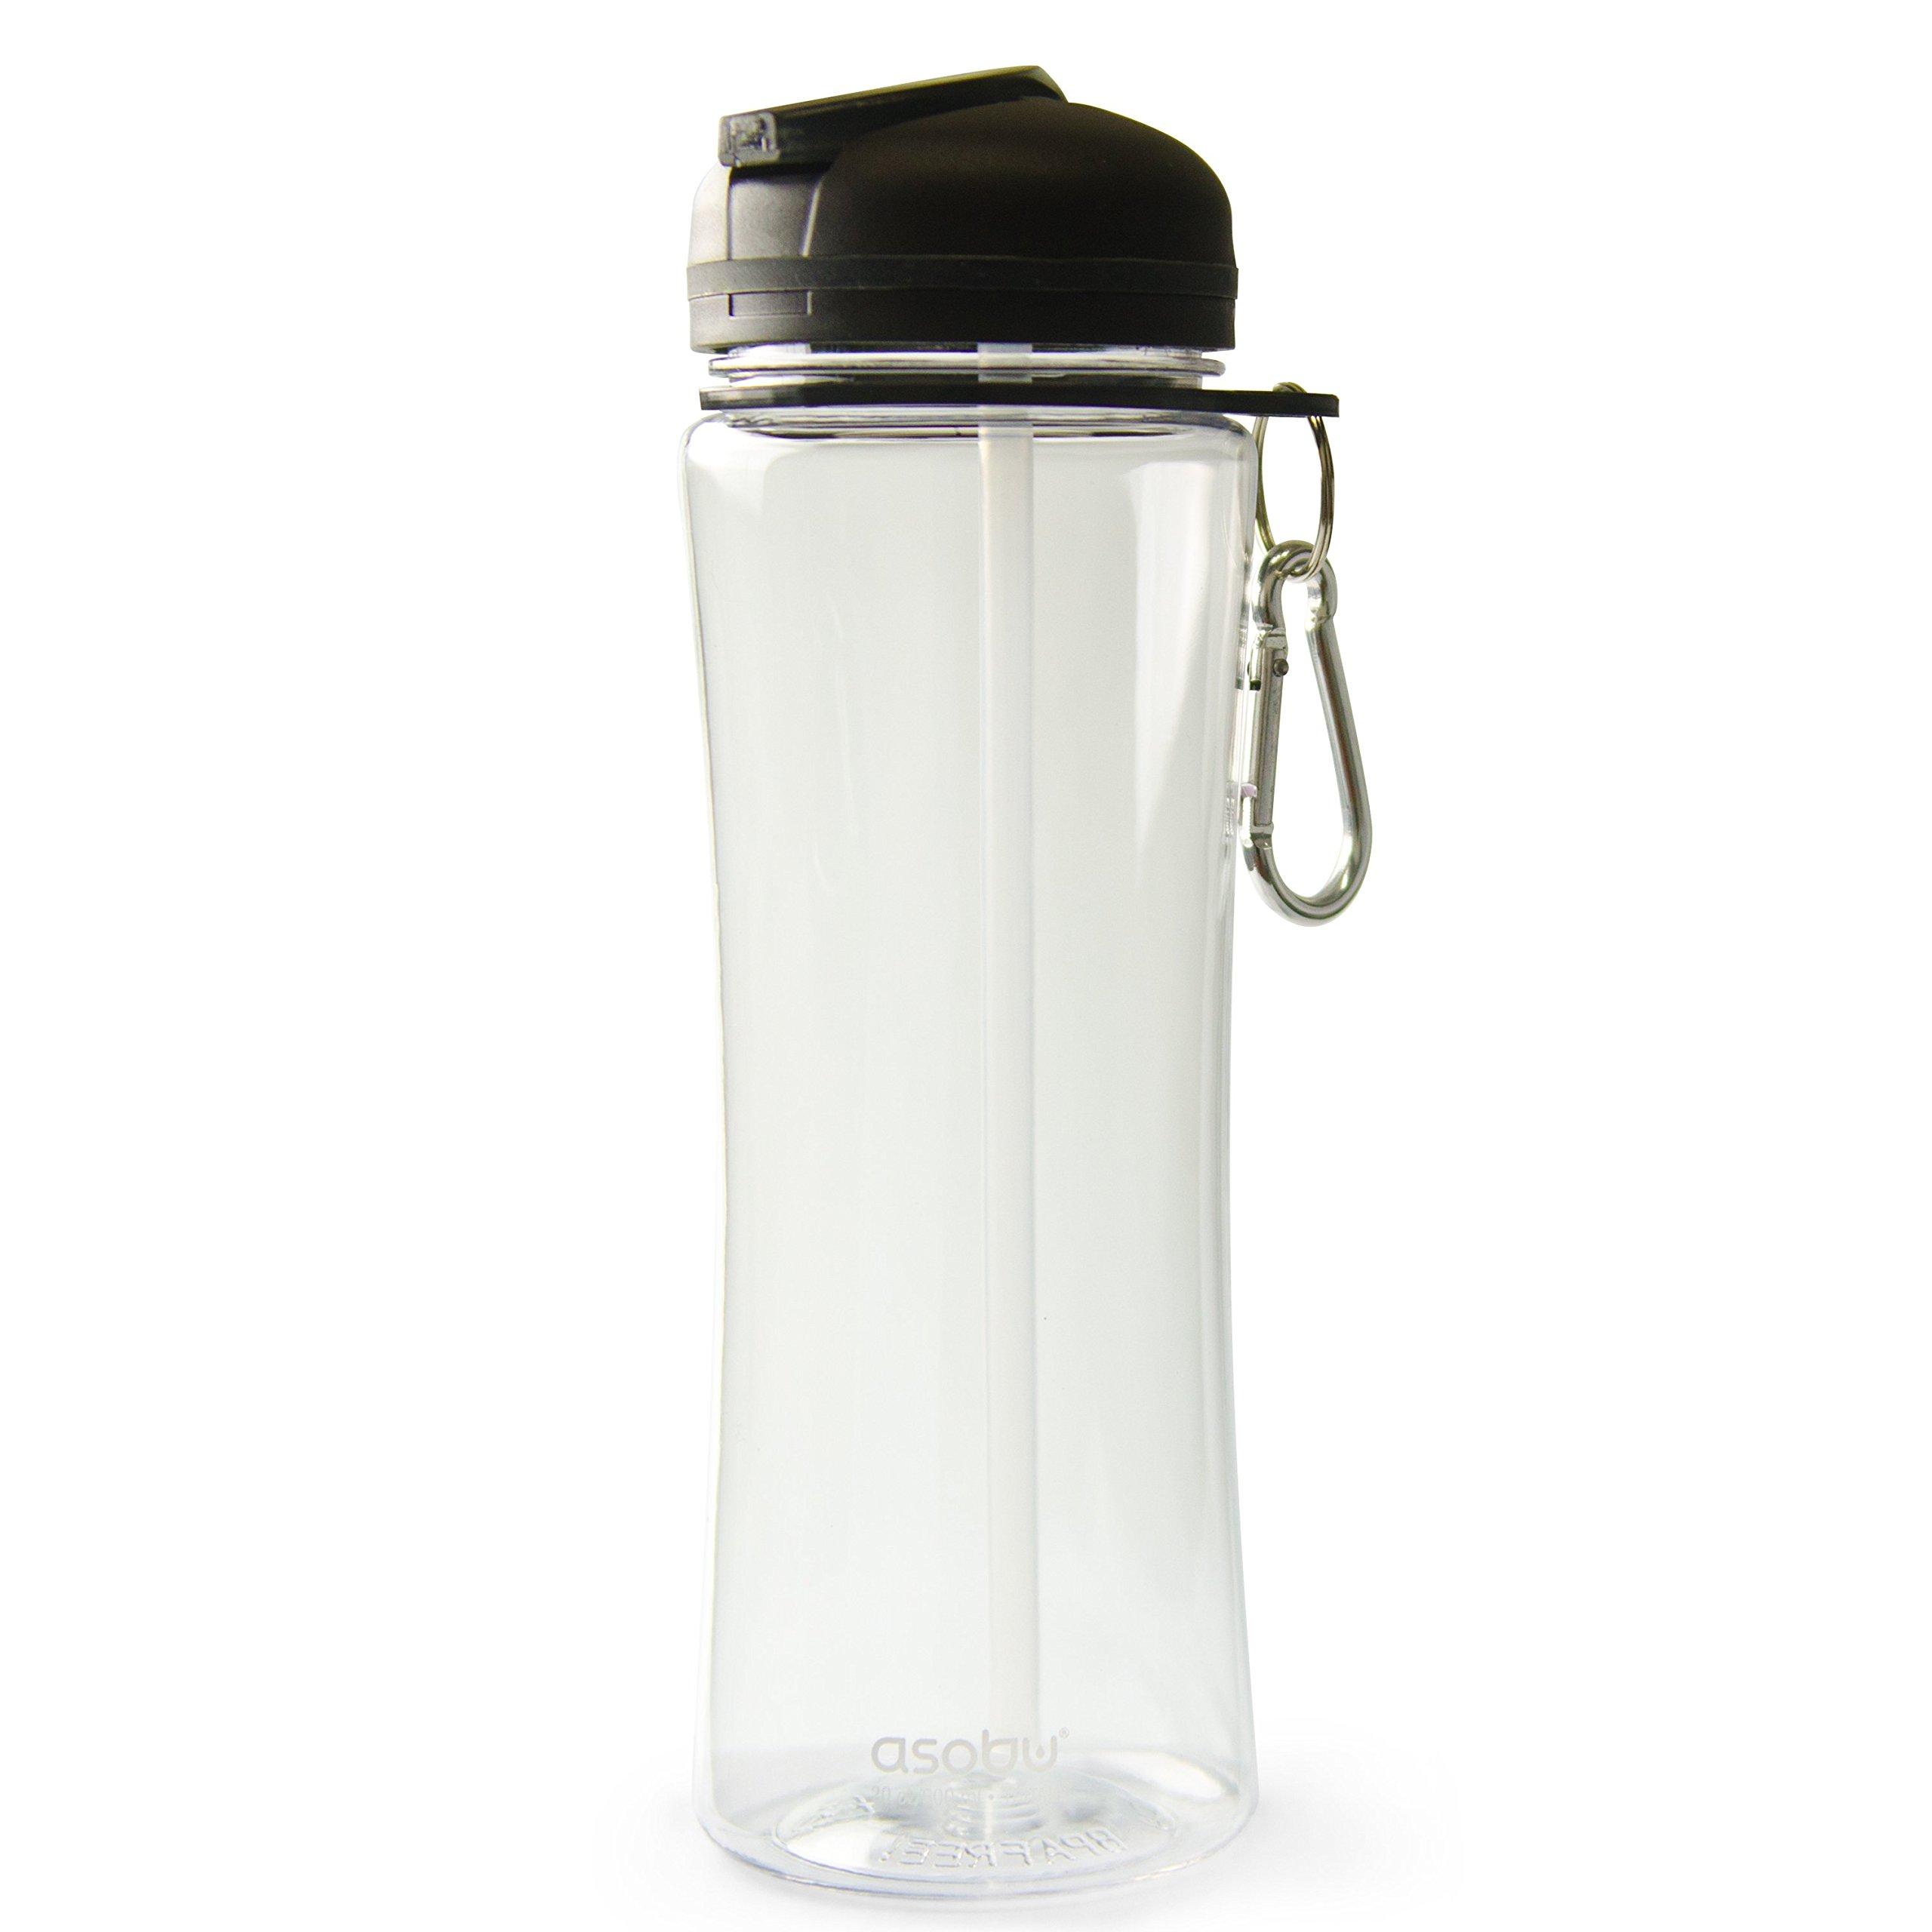 The Asobu TRIUMPH SPORT HYDRATION BOTTLE 20oz Tritan Free Flow spout Water bottle (Clear) by Asobu (Image #1)